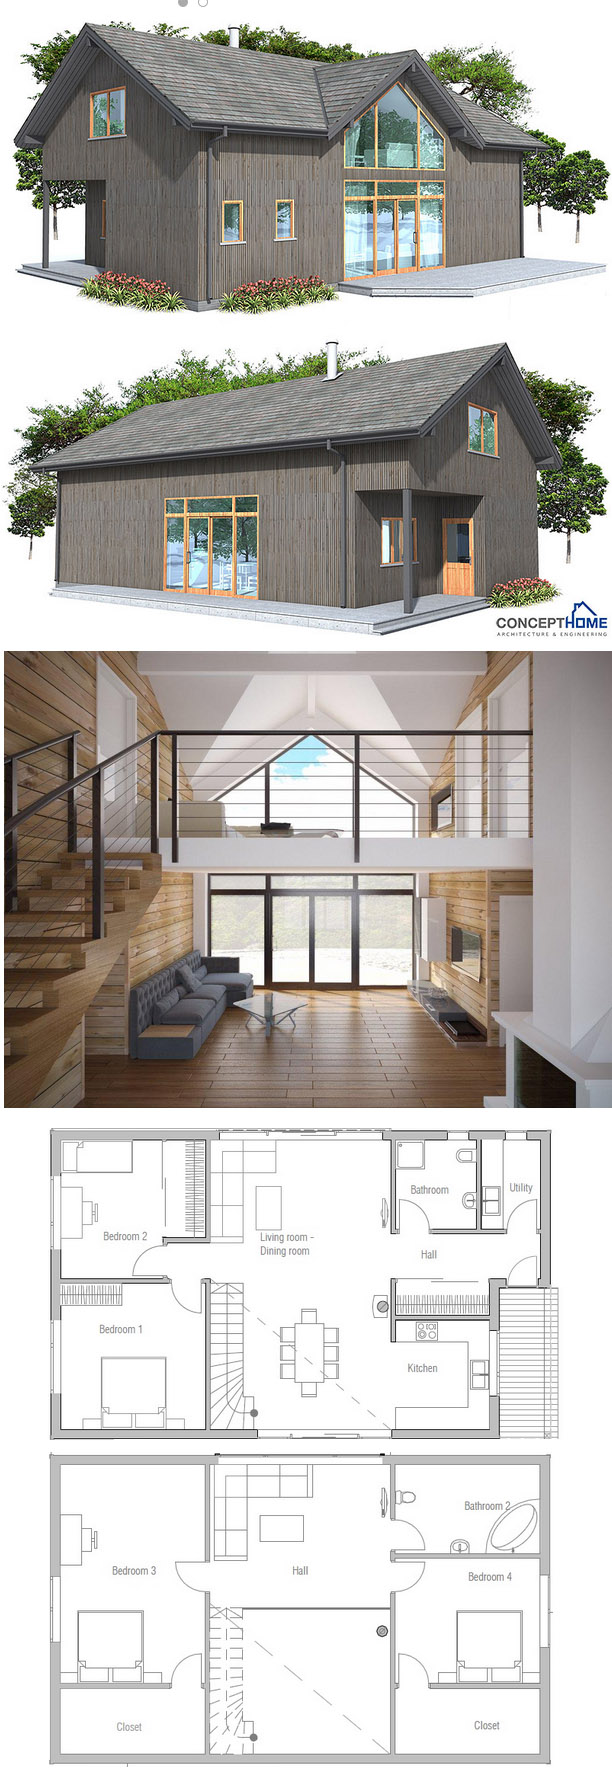 Urban Design Floor Plans Loft Floor Plans 2 Bedroom Apartment Floor Plan Sims 4 Houses Layout Floor Plans Cot Loft Floor Plans House Plans House Layouts